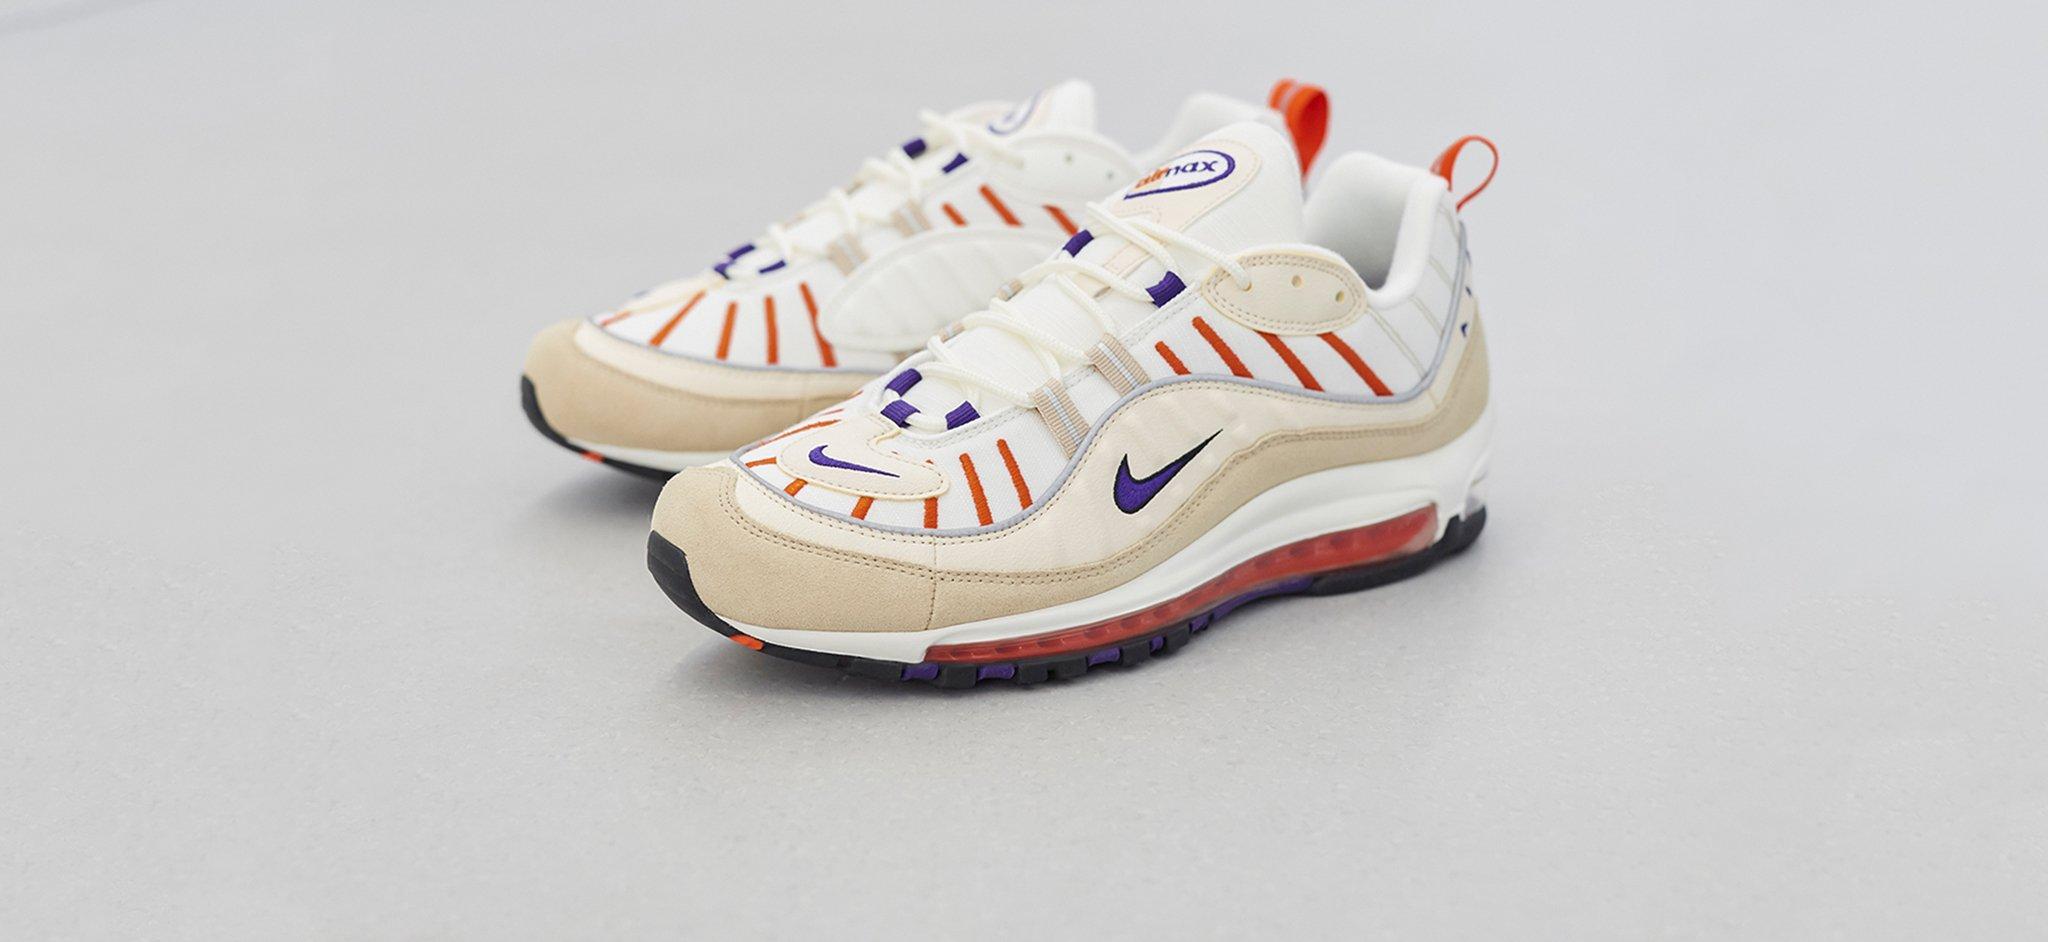 824113438b3874 Nike Air Max 98 - Desert Ore